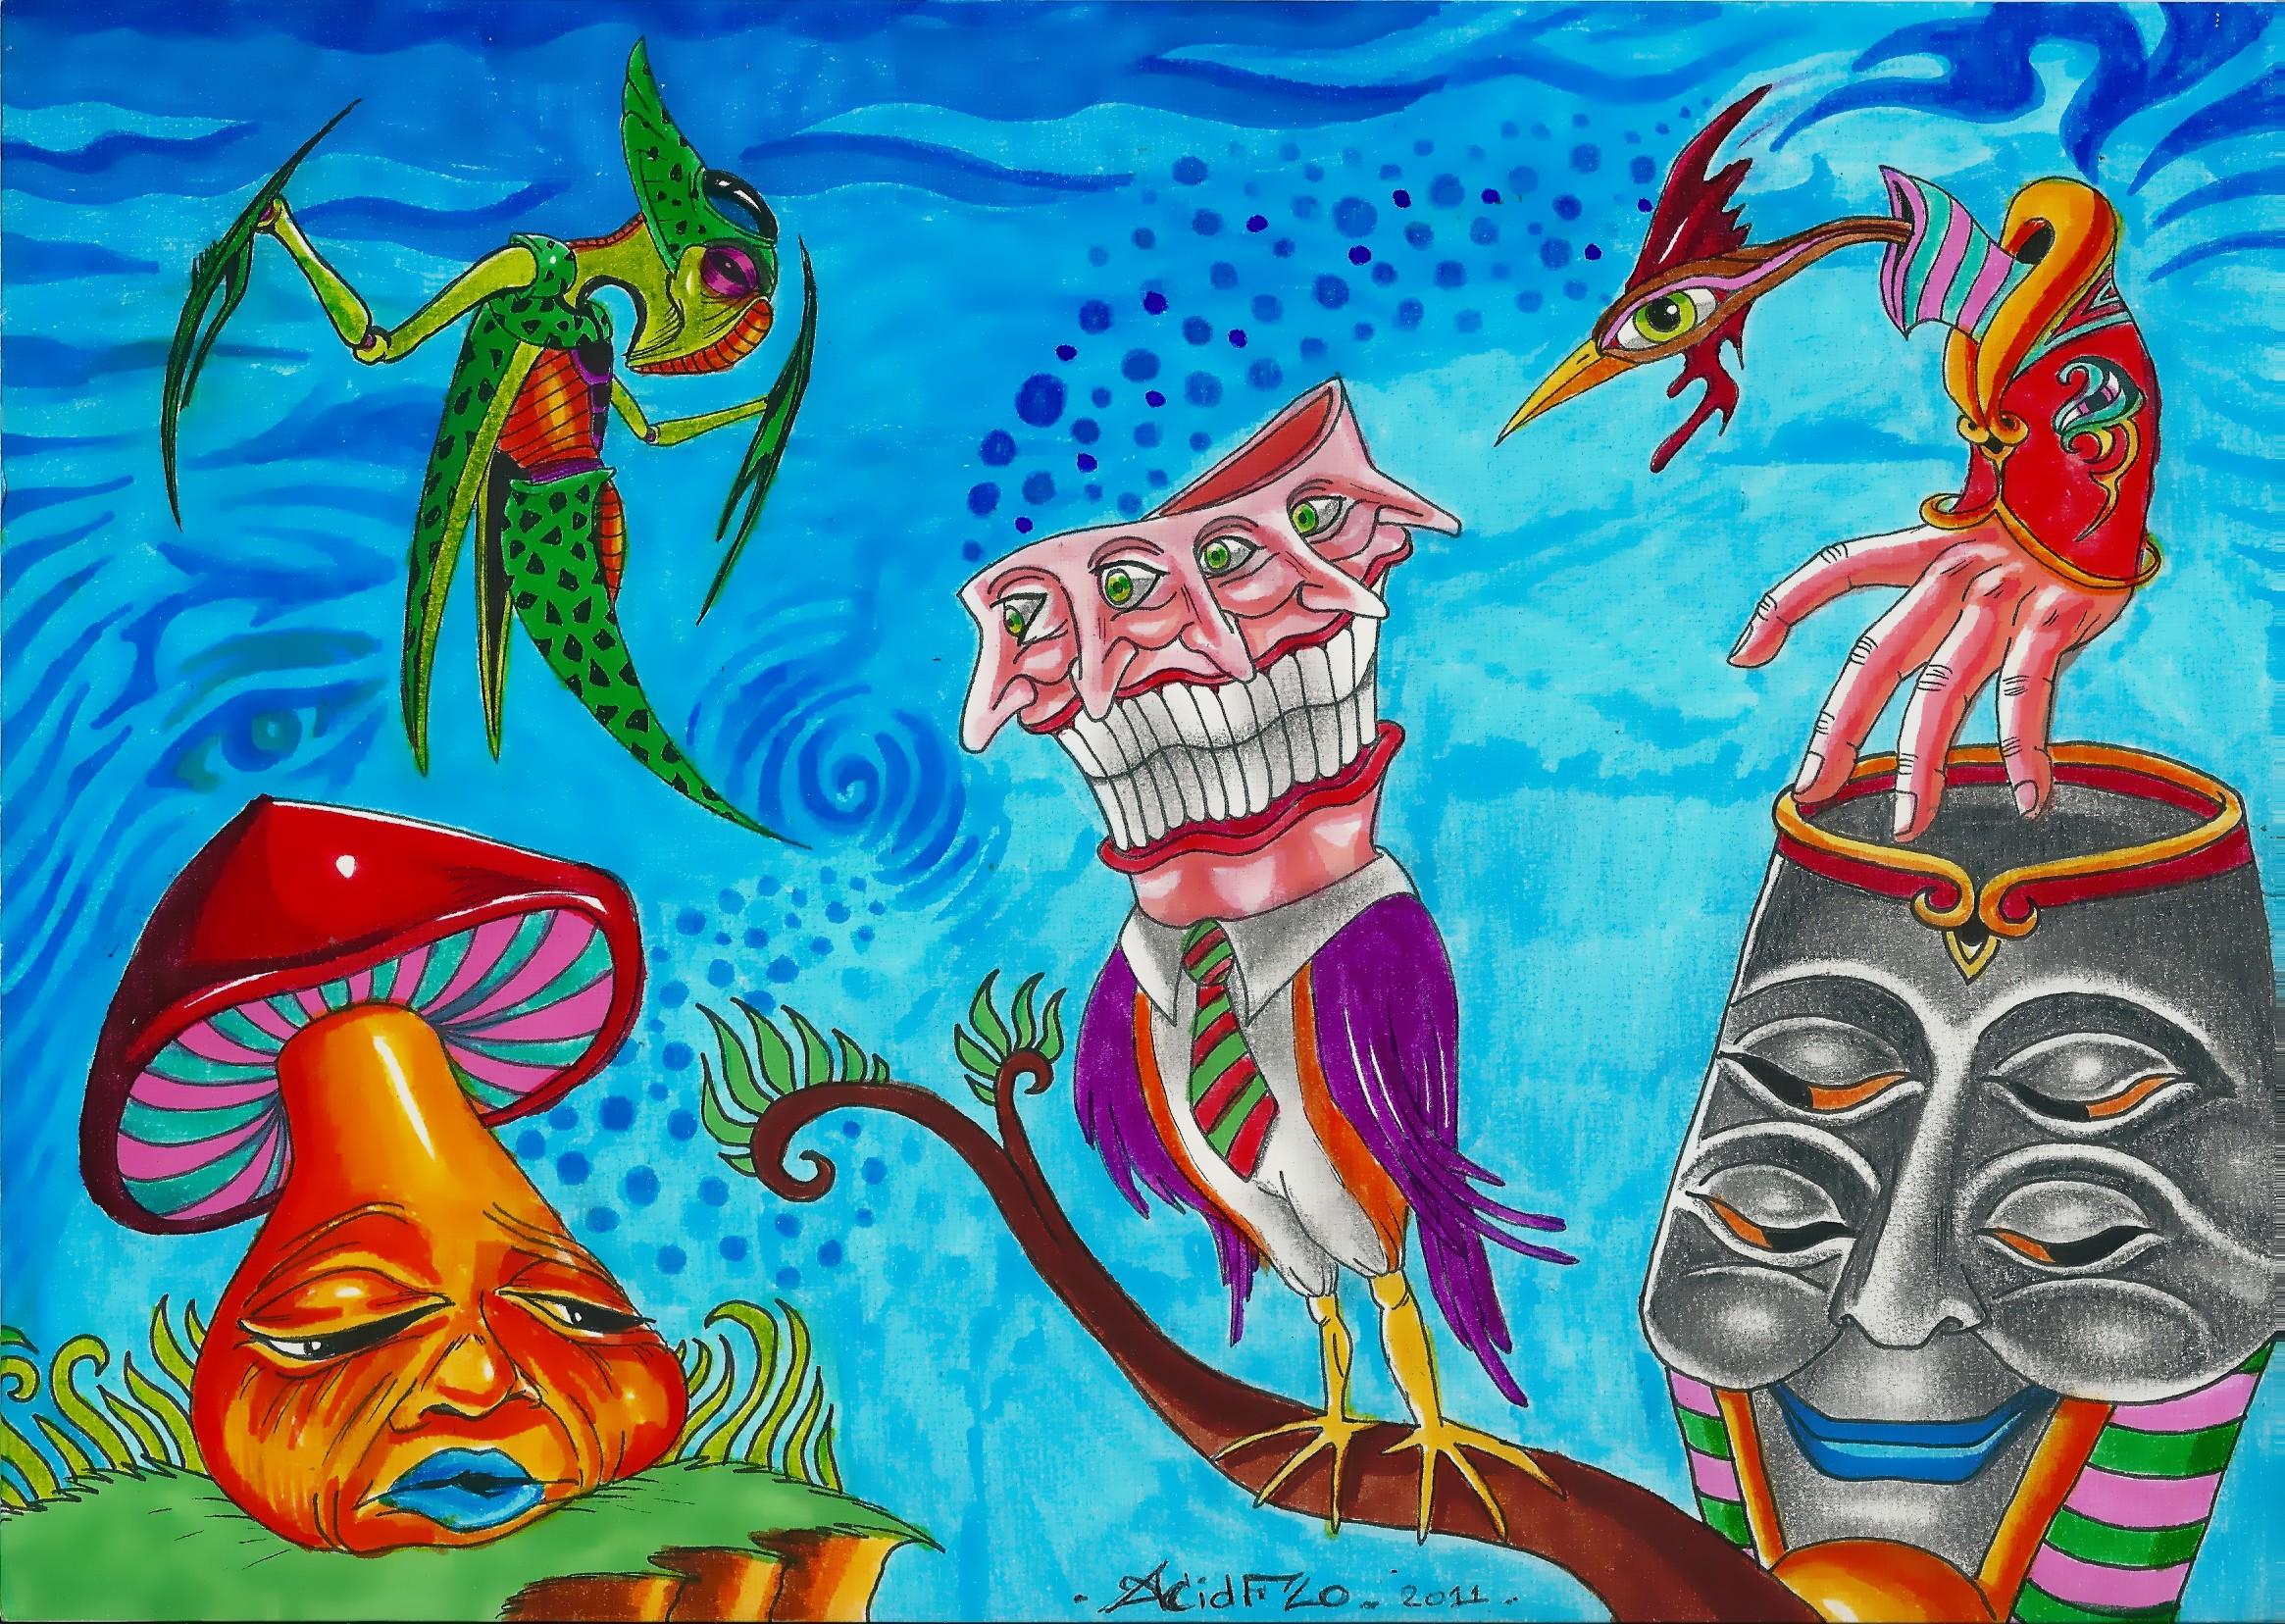 FLUDOBUDOHU By Acid Flo